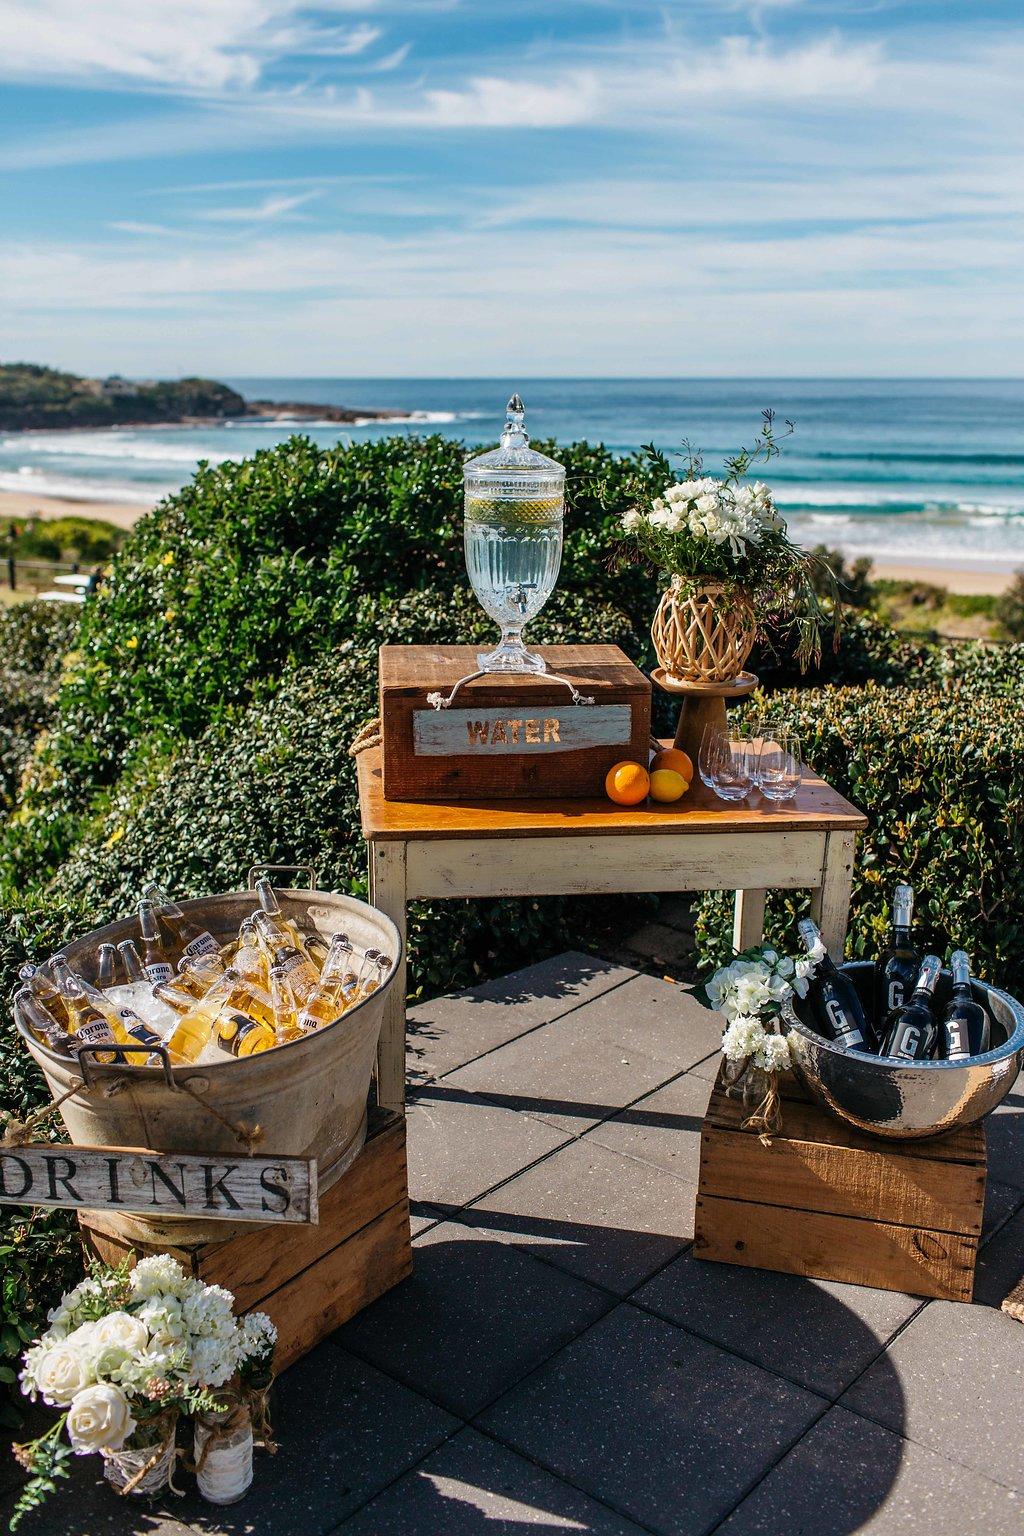 Drinks_Station_Styling_Wedding_Event_Hire_Sydney.jpg